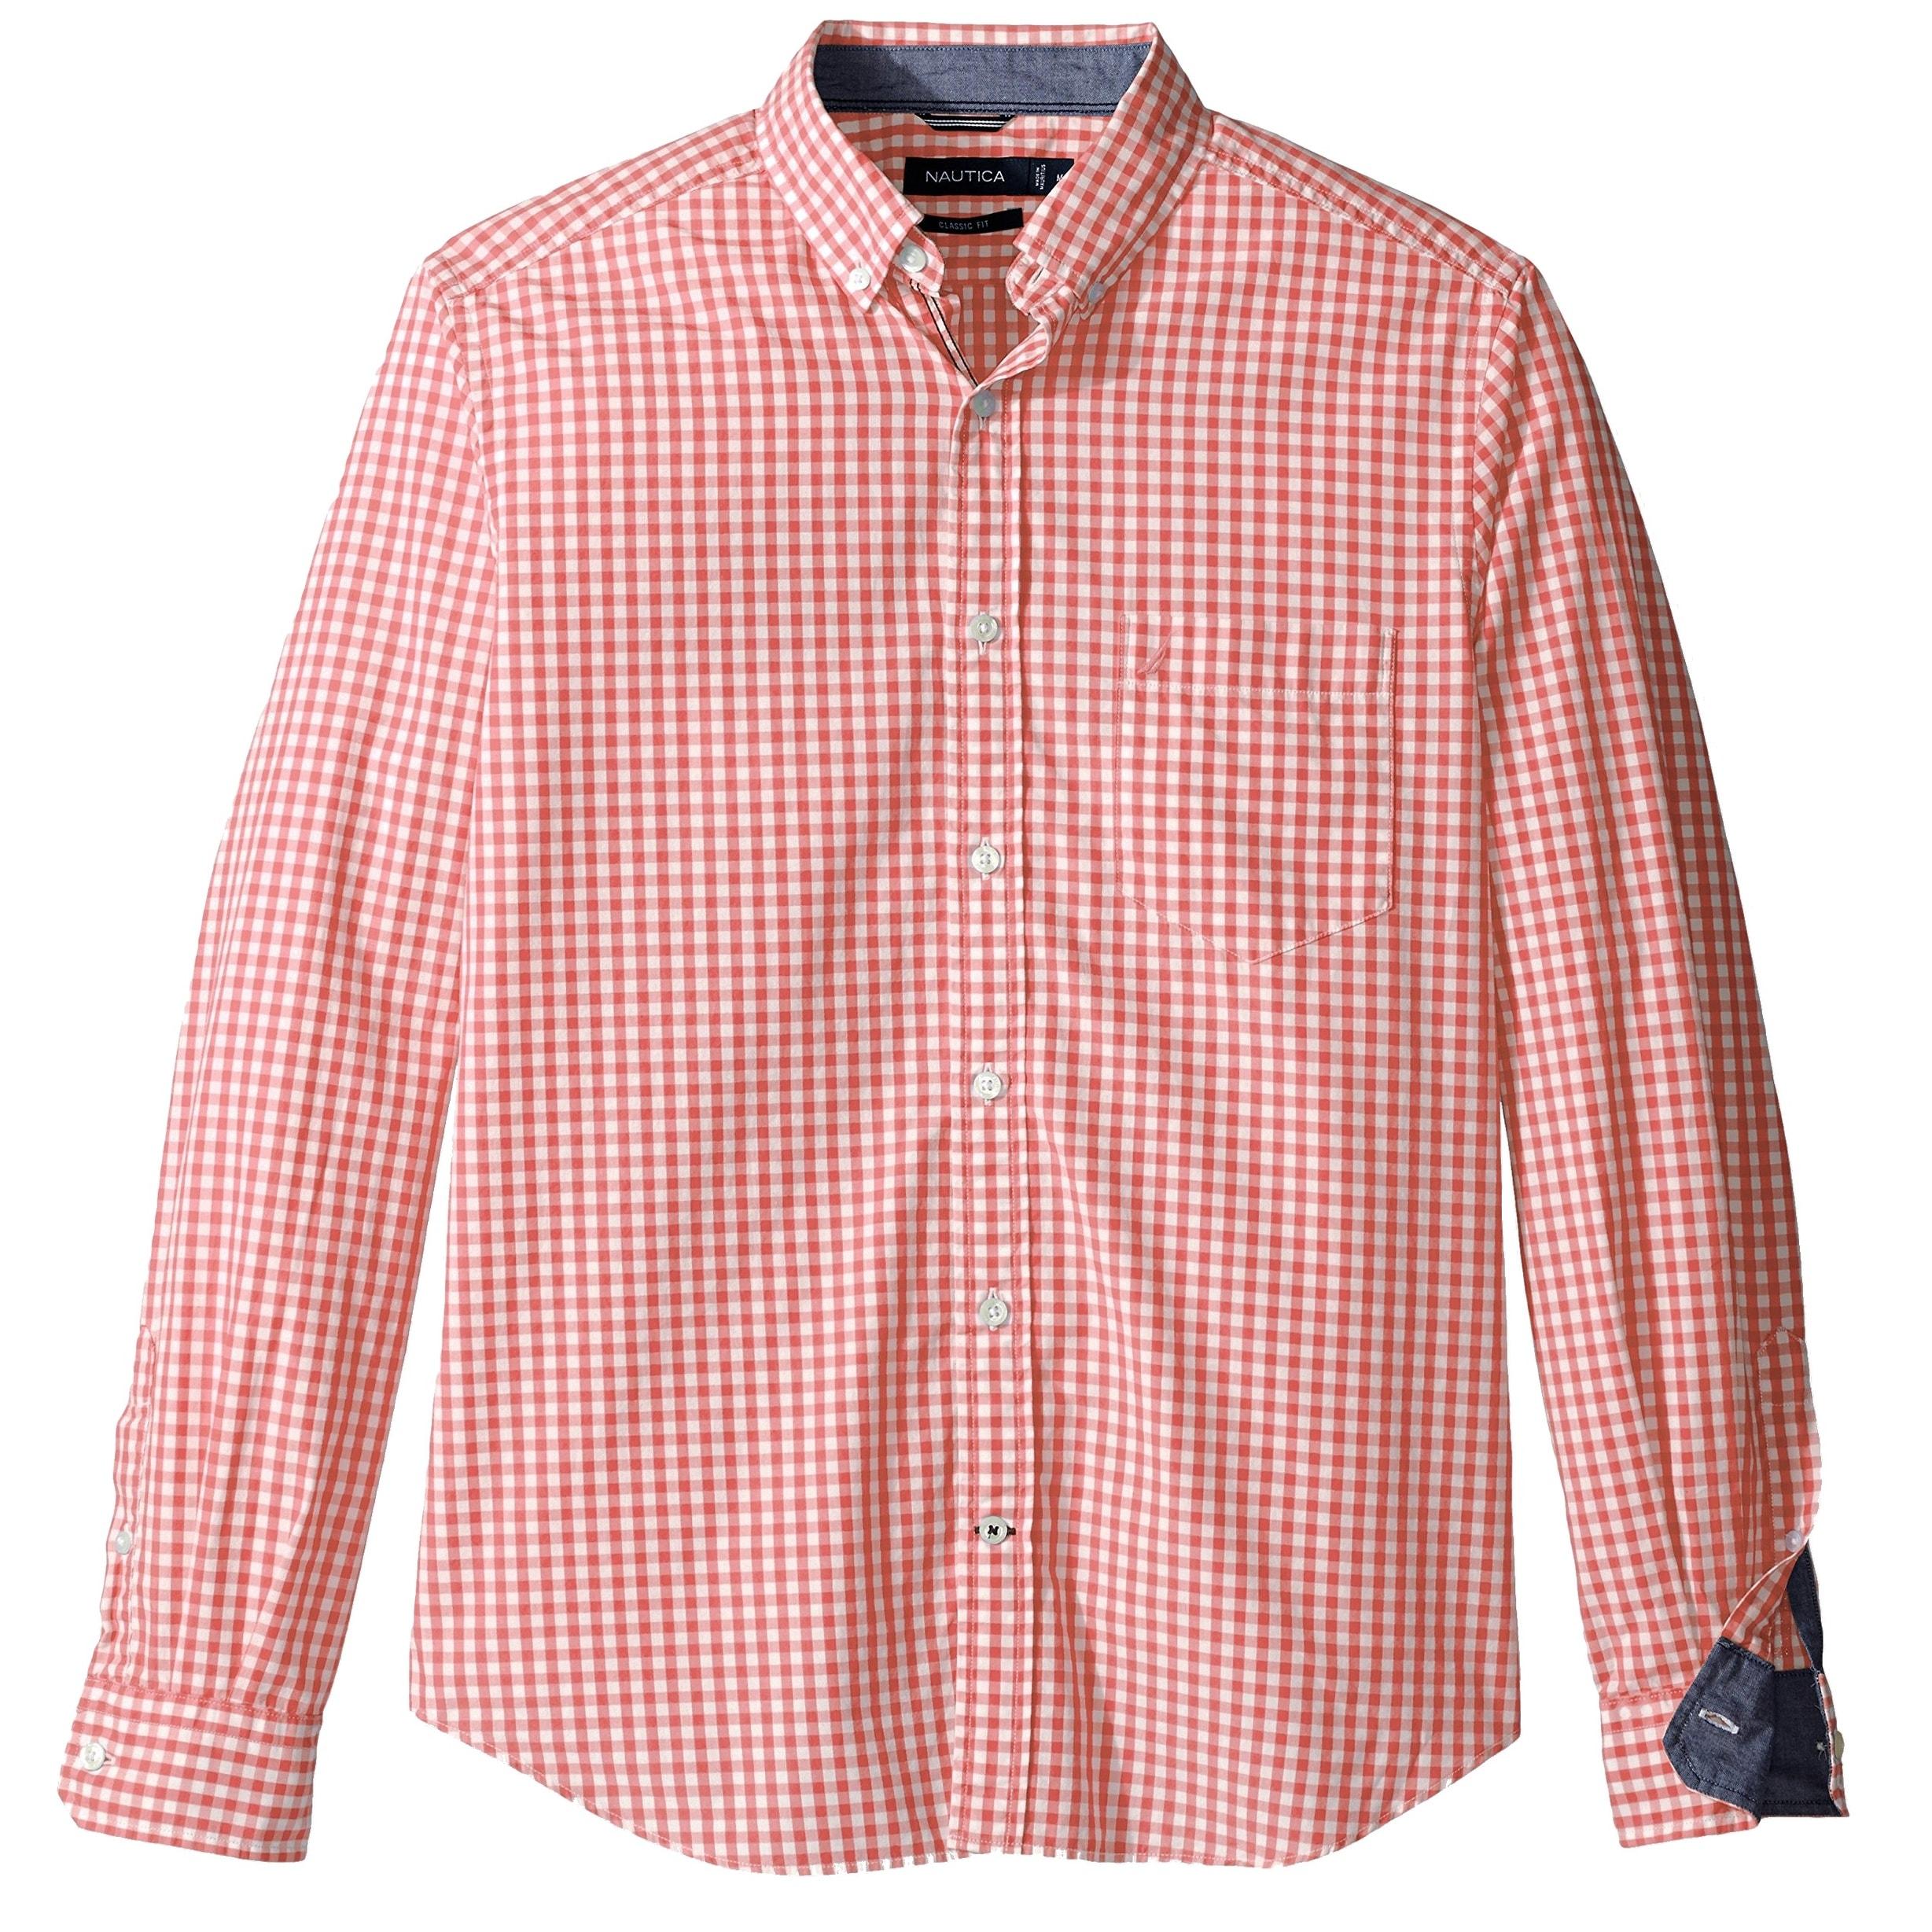 Shop Nautica Orange Mens Size 2xl Gingham Check Pocket Button Down